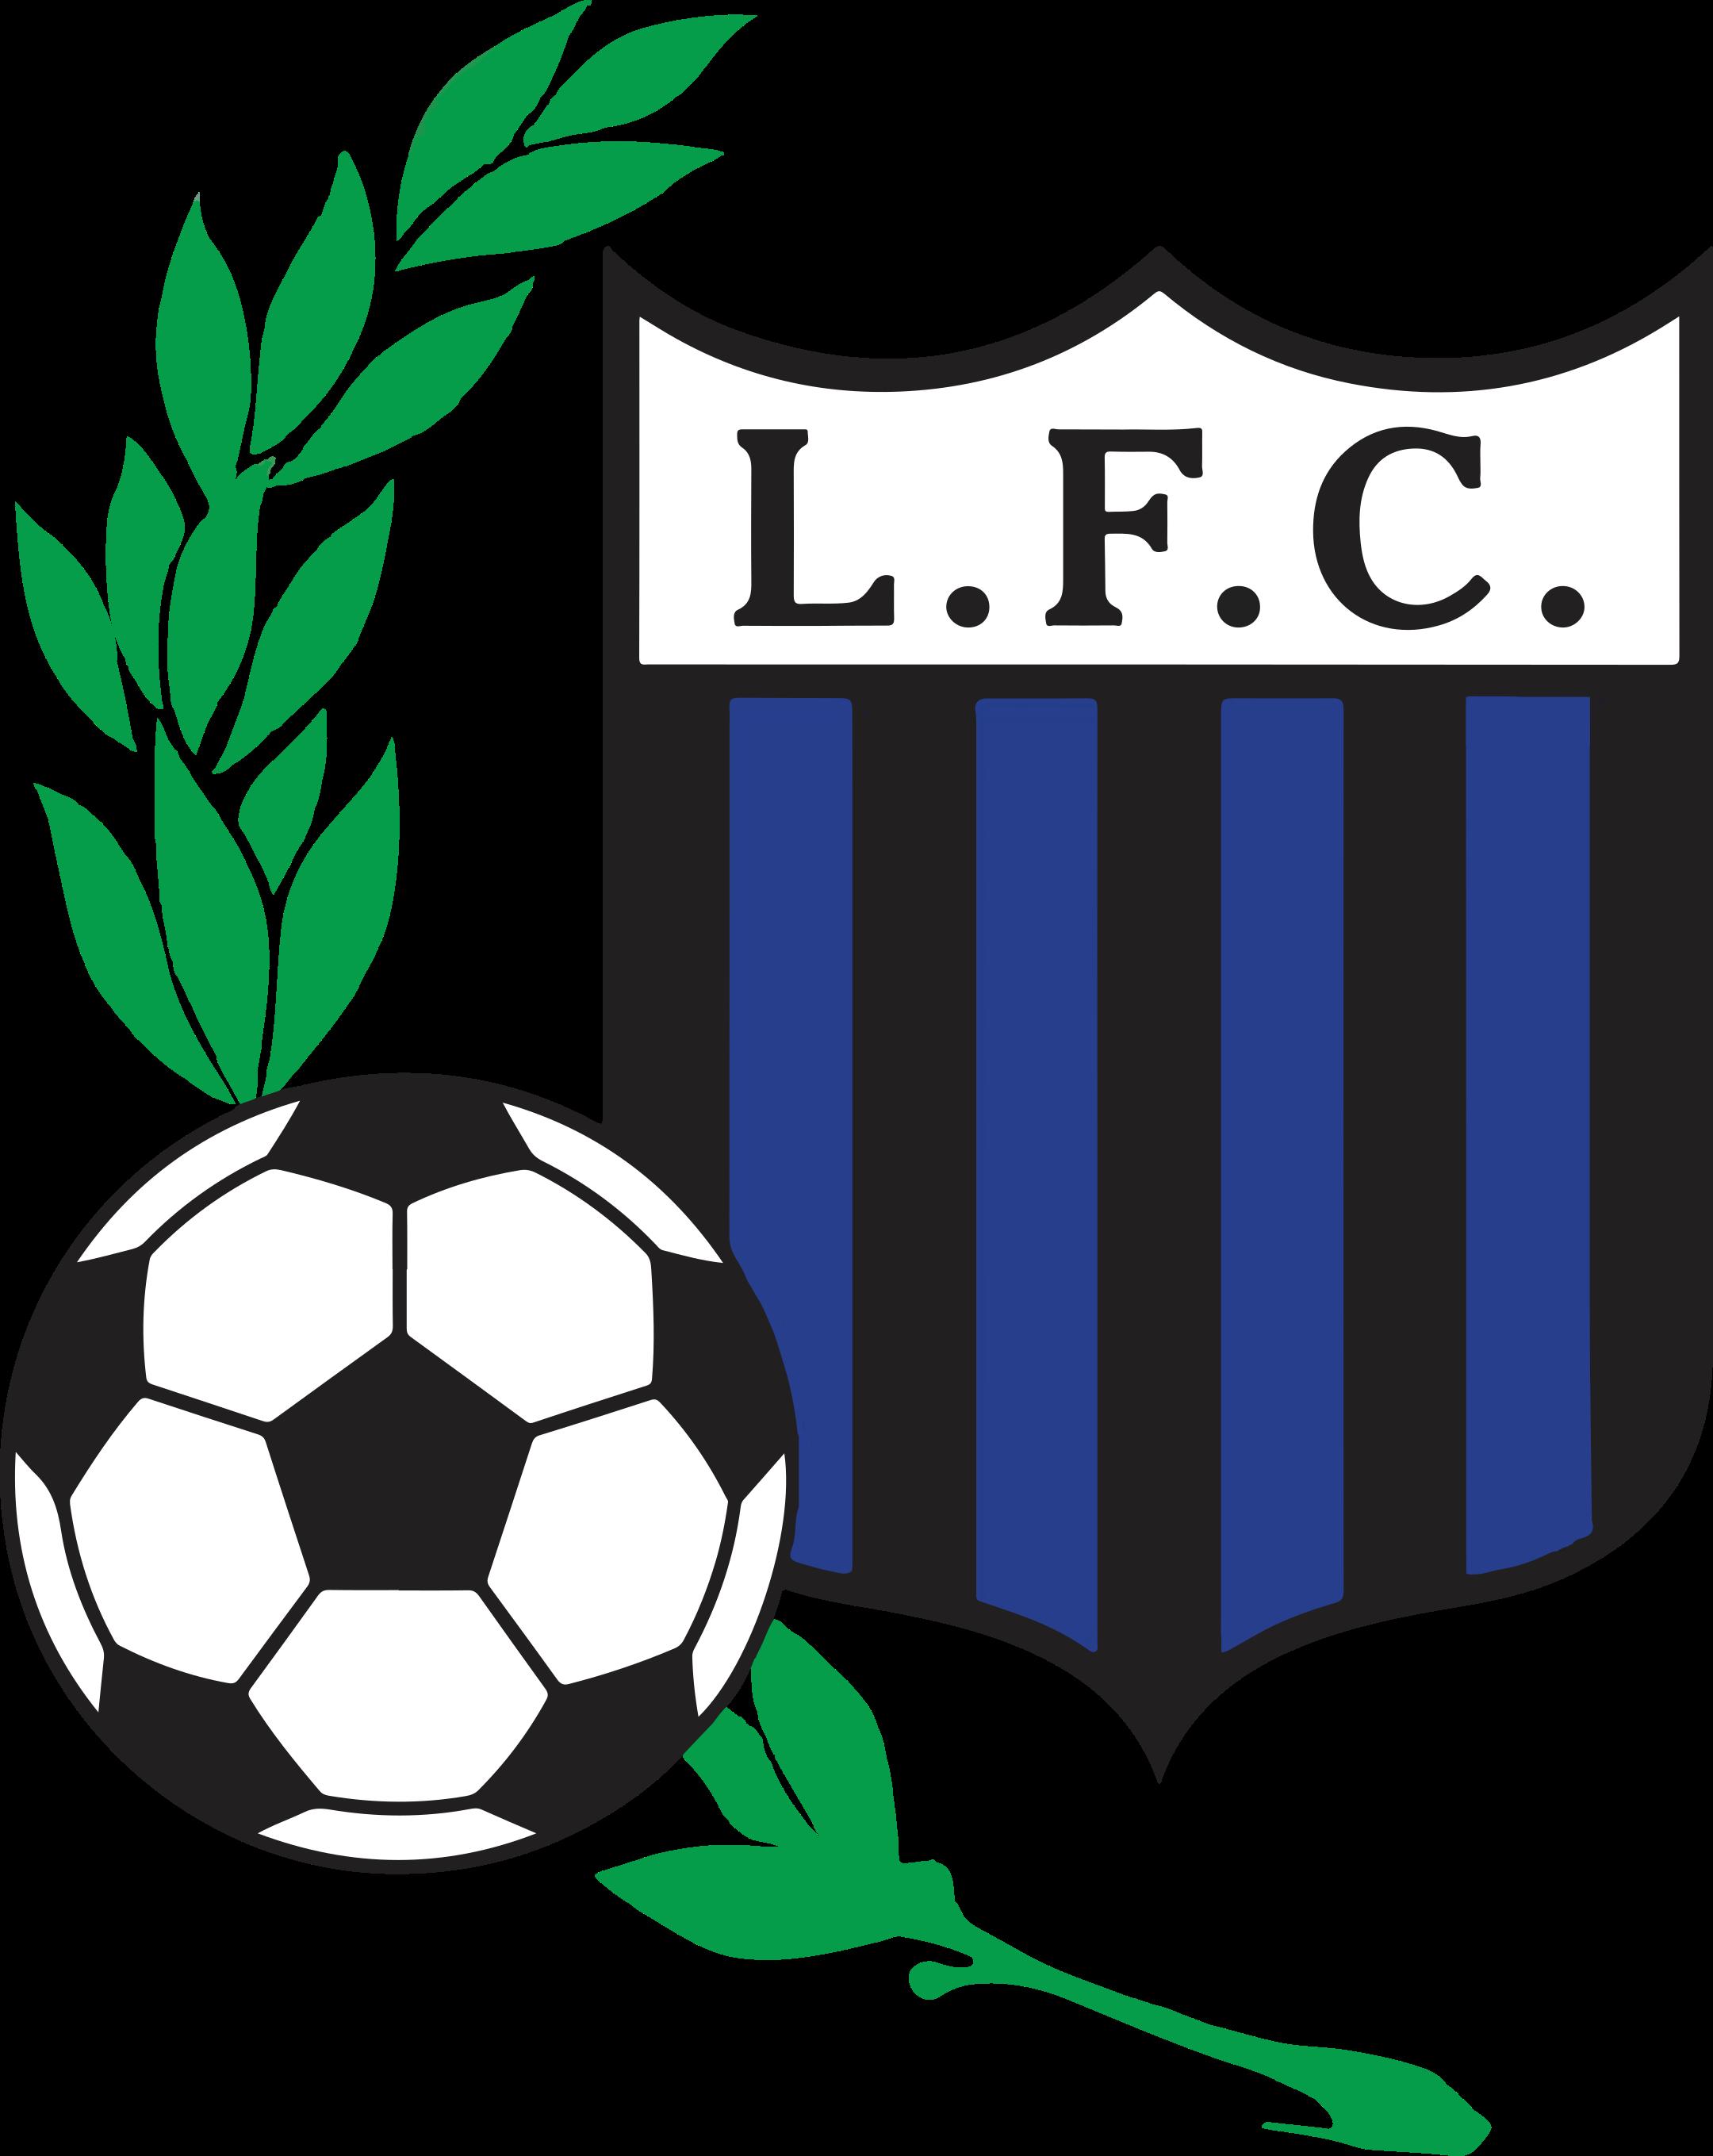 liverpool fc uruguai logo 1 - Liverpool FC (Uruguay) - Logo